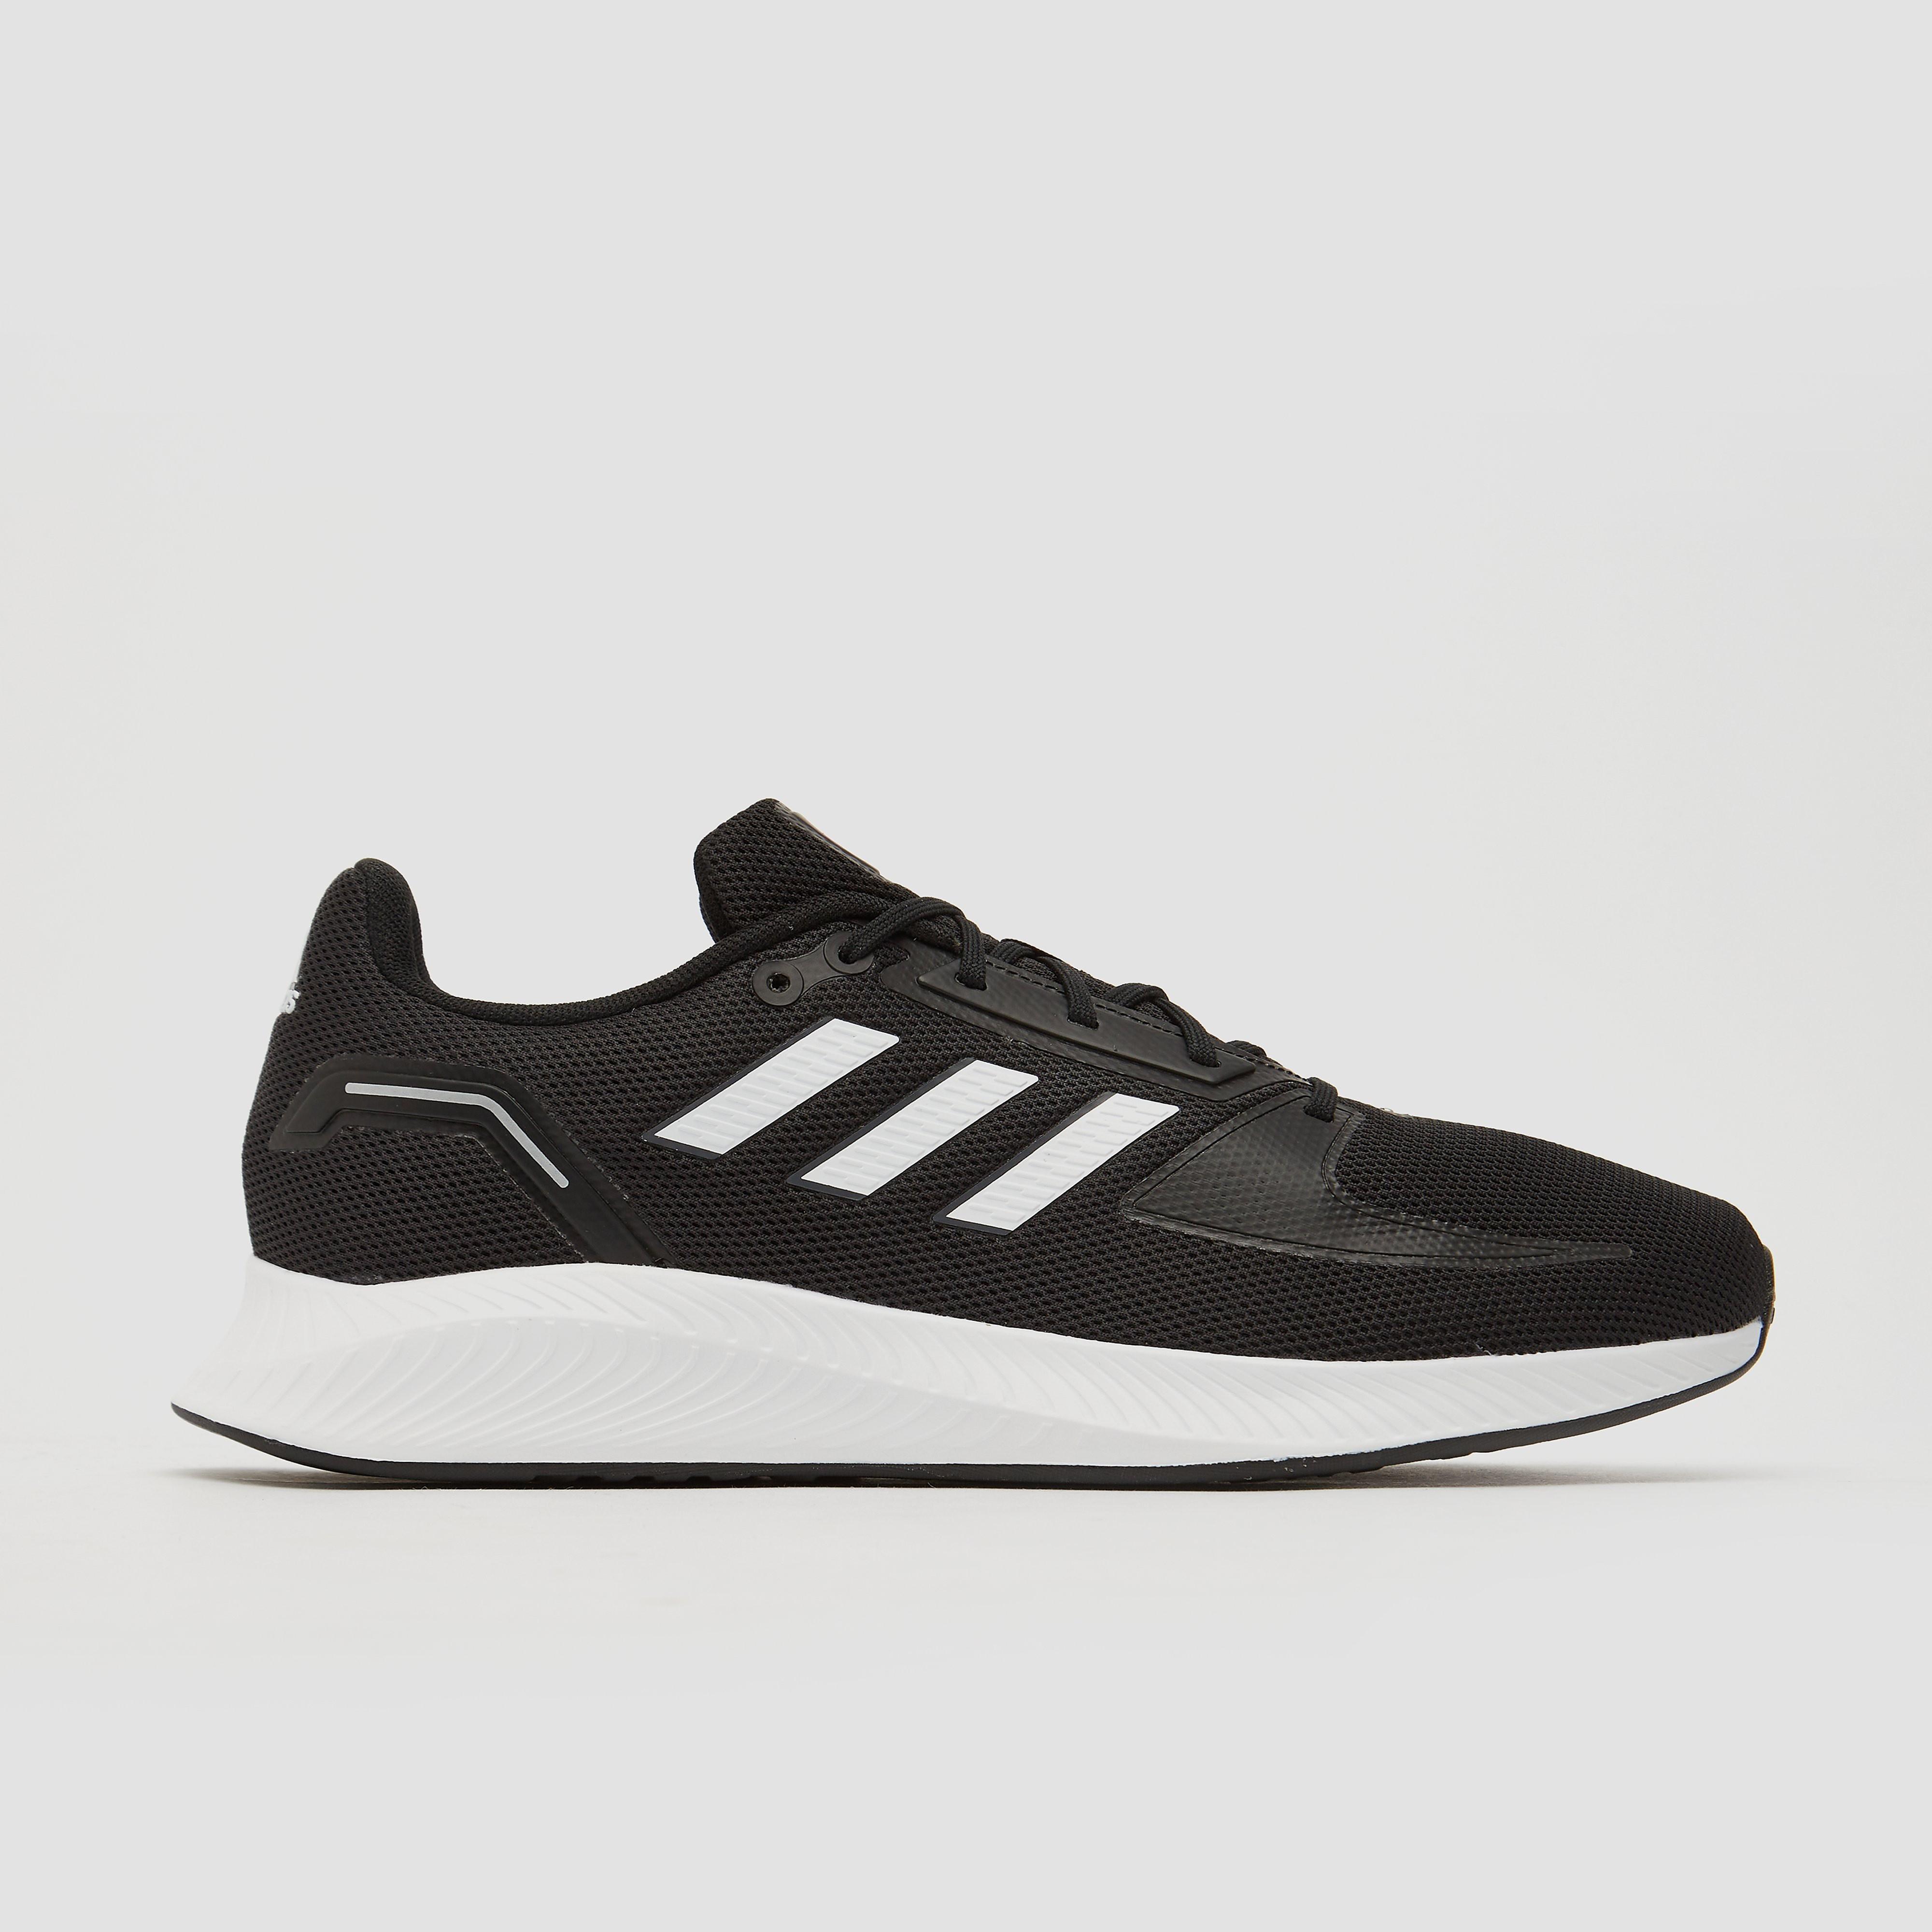 Adidas Falcon 2 Heren Core Black / Cloud White / Grey Six Heren online kopen